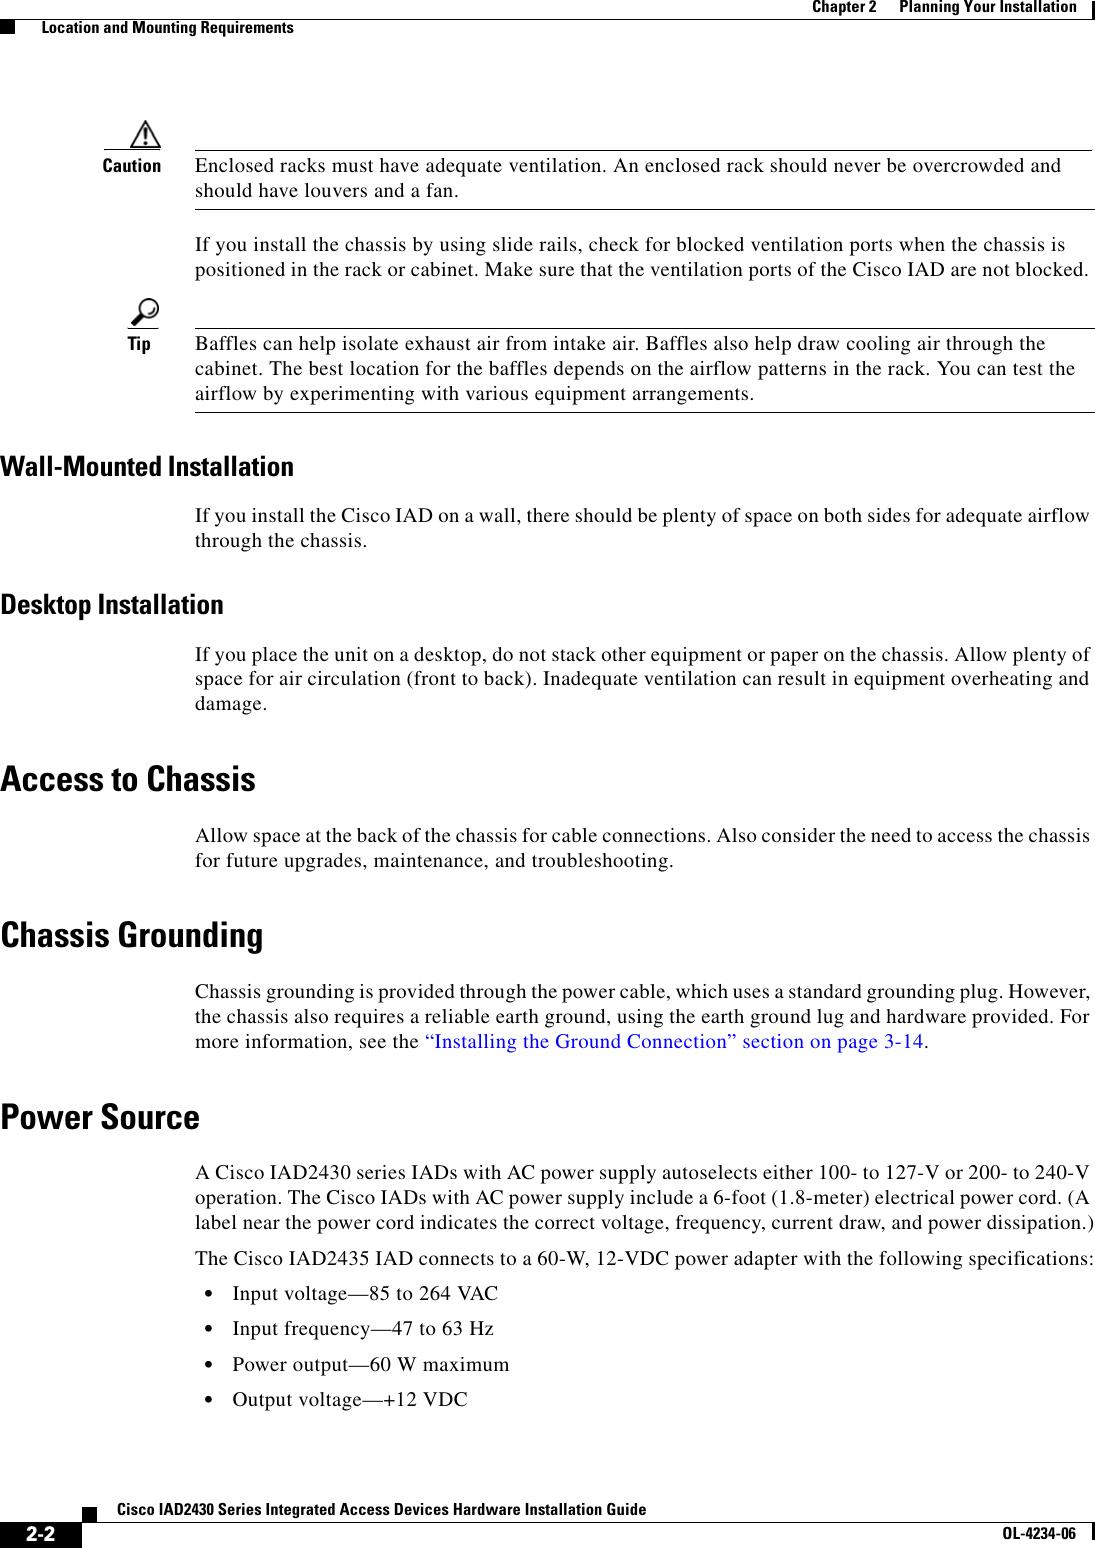 Cisco Systems Iad2430 Users Manual